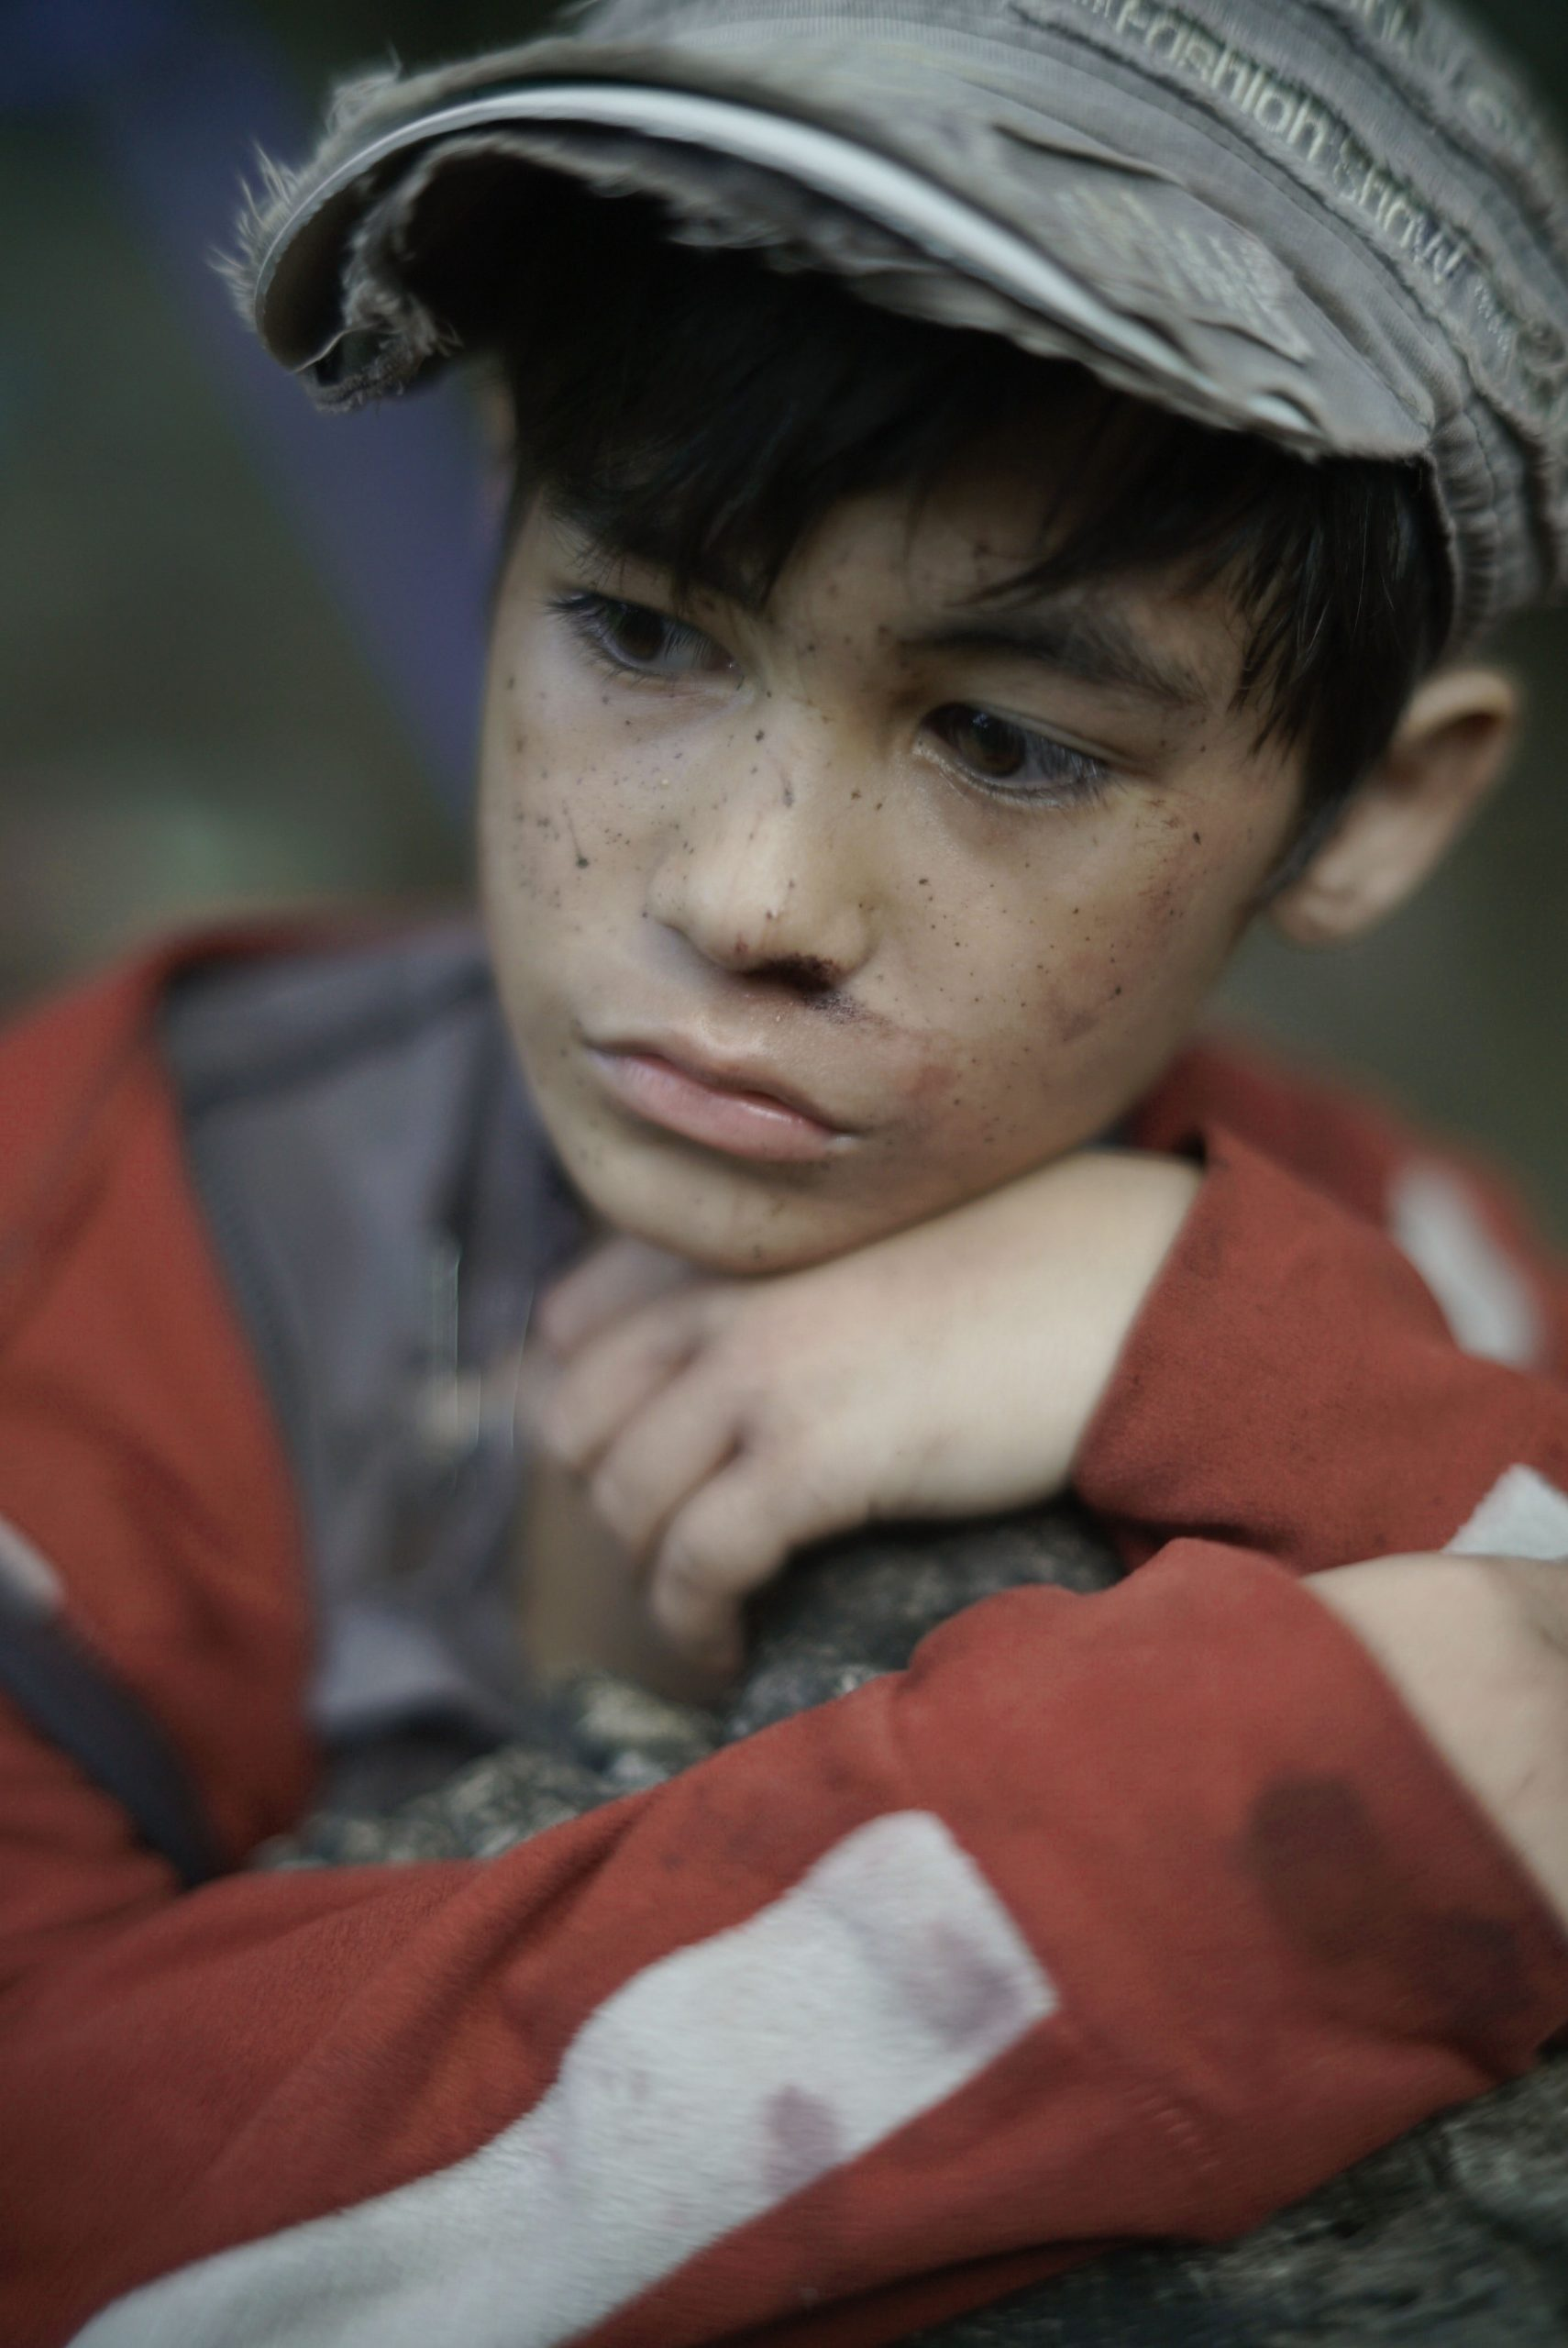 Sad Boy Whatsapp Dp Images photo for hd